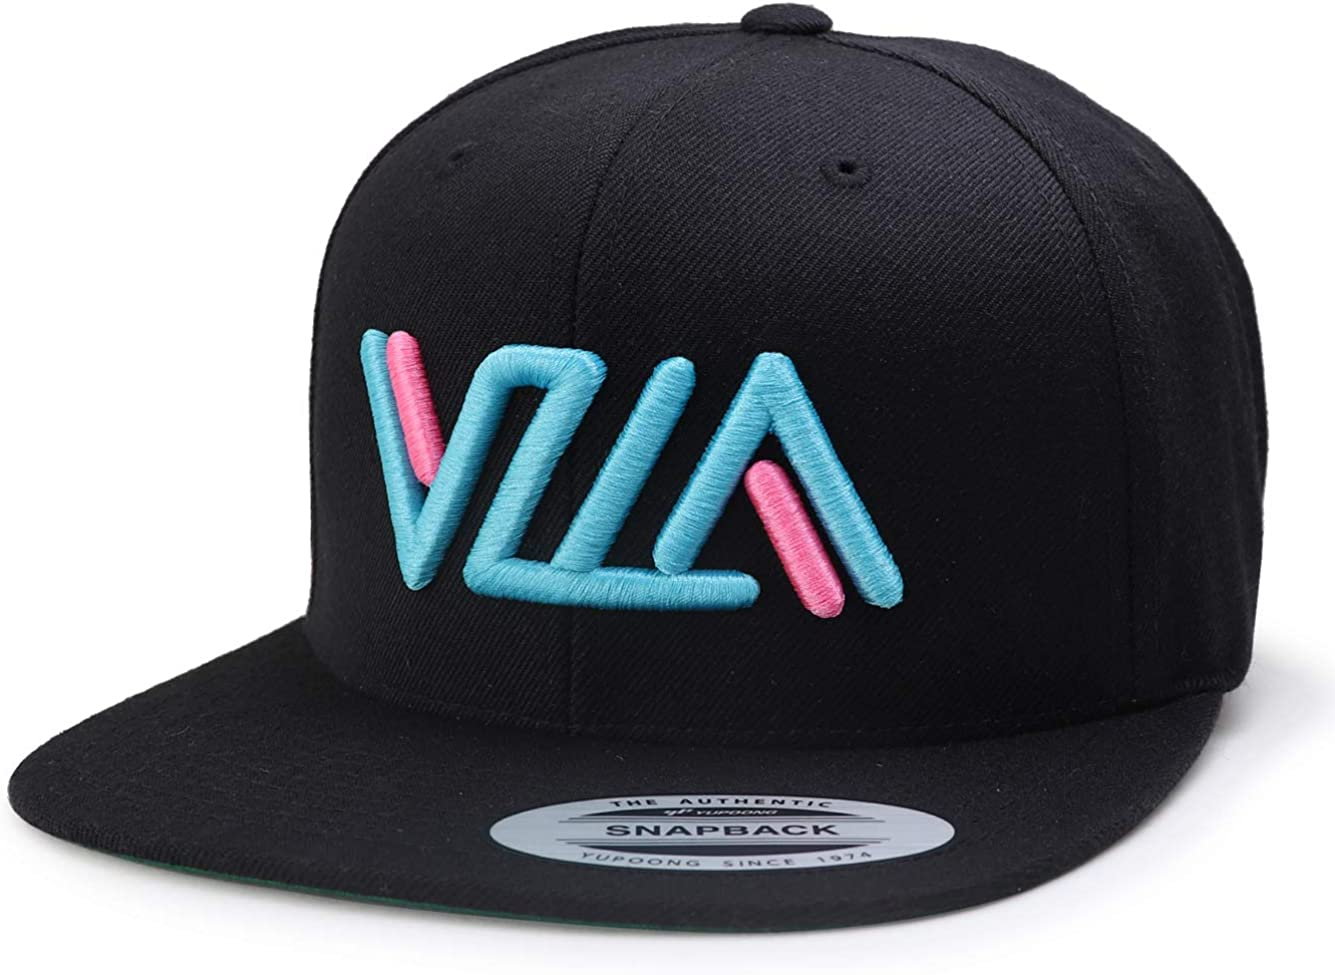 VZLA Snapback hat Flat Bill Cap Premium Quality Durable Comfortable Fit